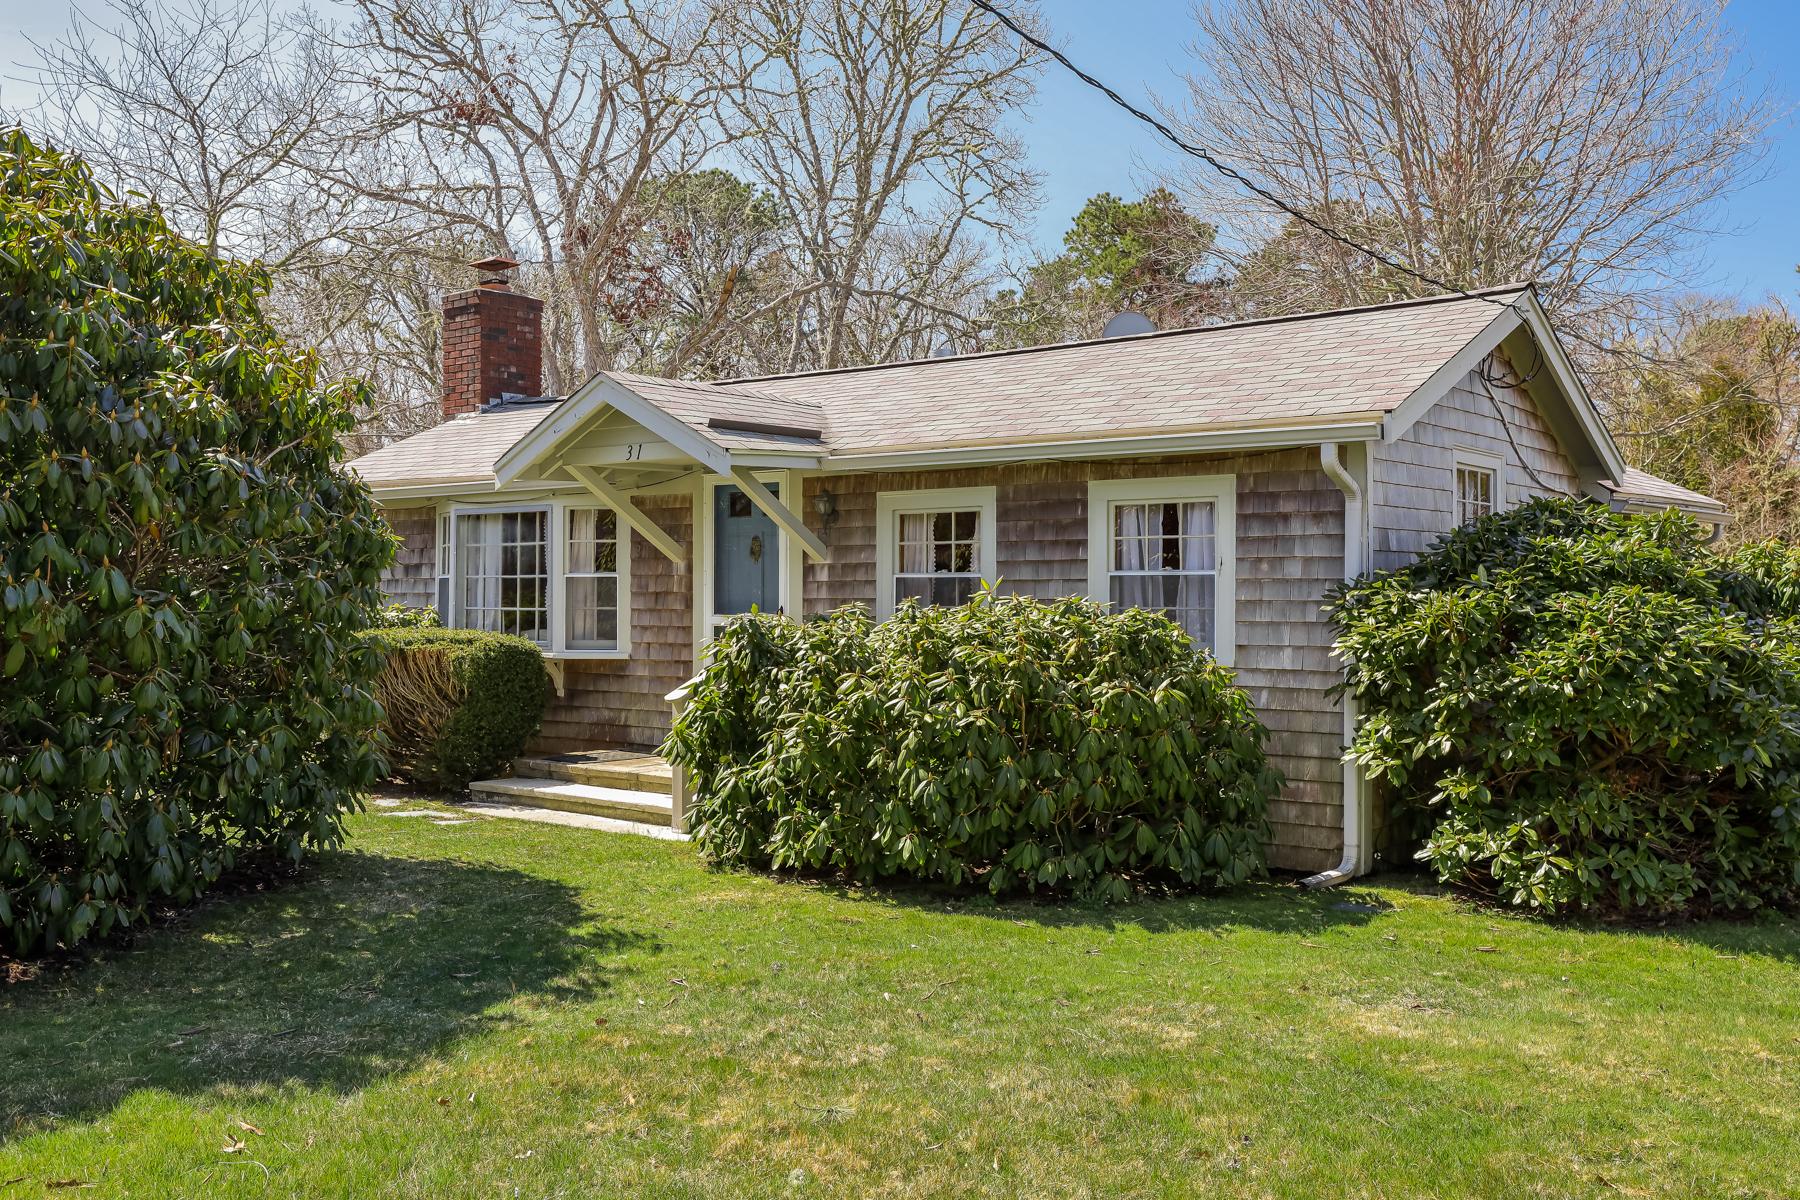 Single Family Homes για την Πώληση στο 31 Division Street, Dennis Port Dennis Port, Μασαχουσετη 02639 Ηνωμένες Πολιτείες